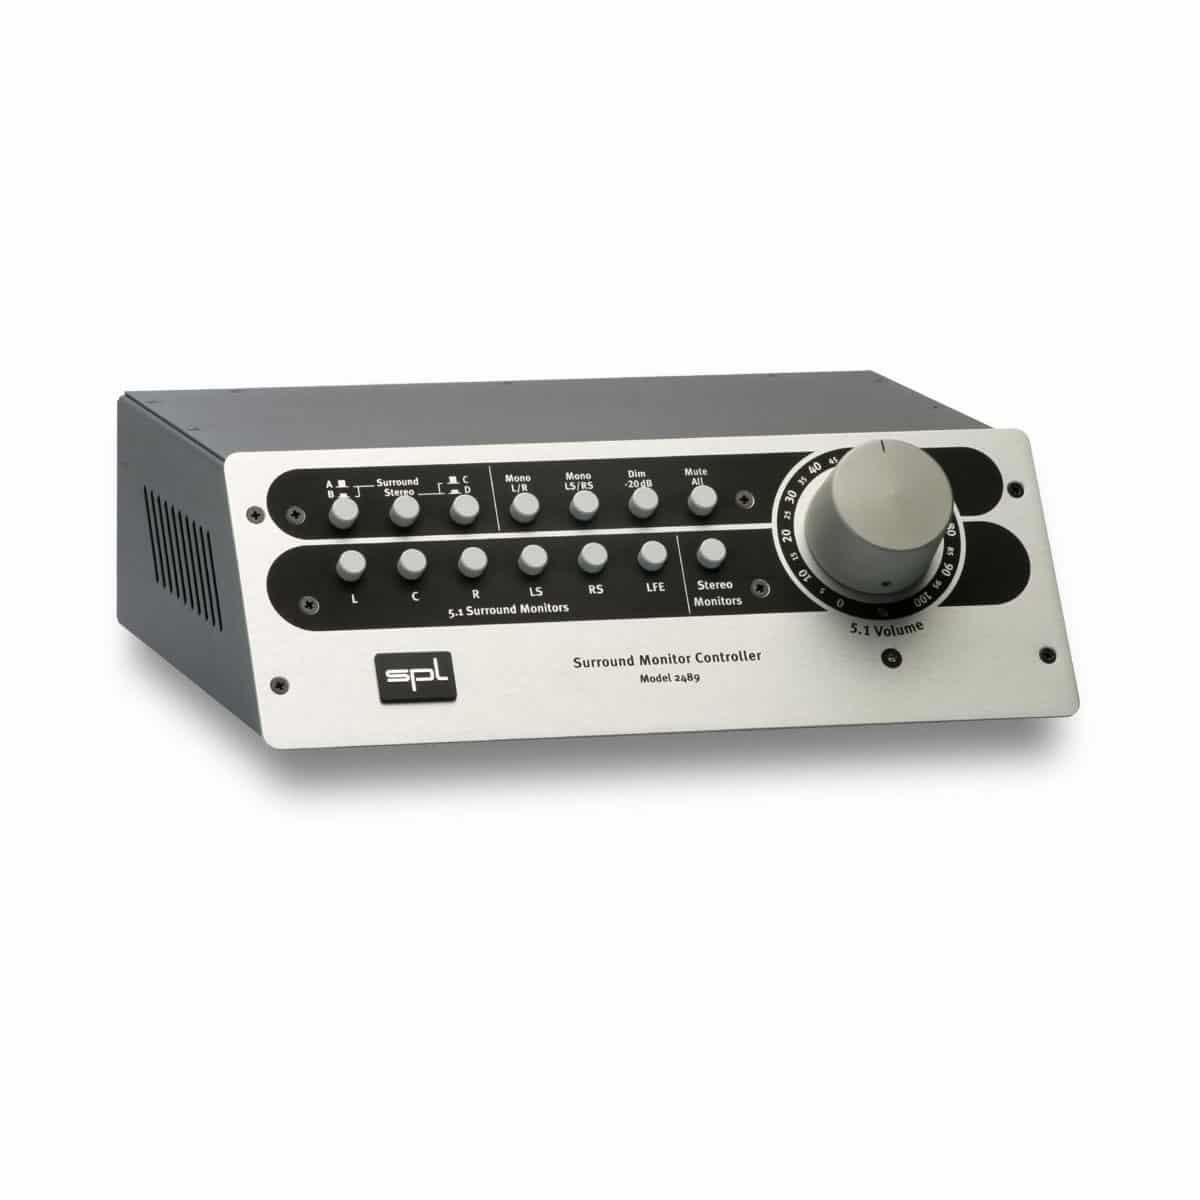 SPL SMC Pro Audio, Audio Monitors, Control Room SPL SMC 03